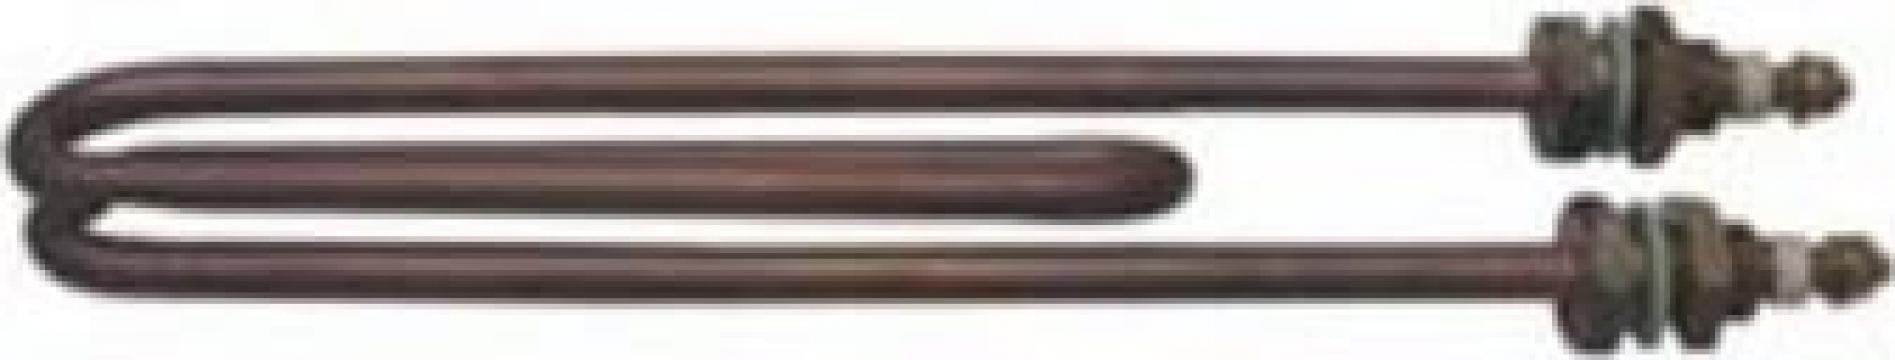 Rezistenta 170mm, 2000W, 1/4 de la Sercotex International Srl